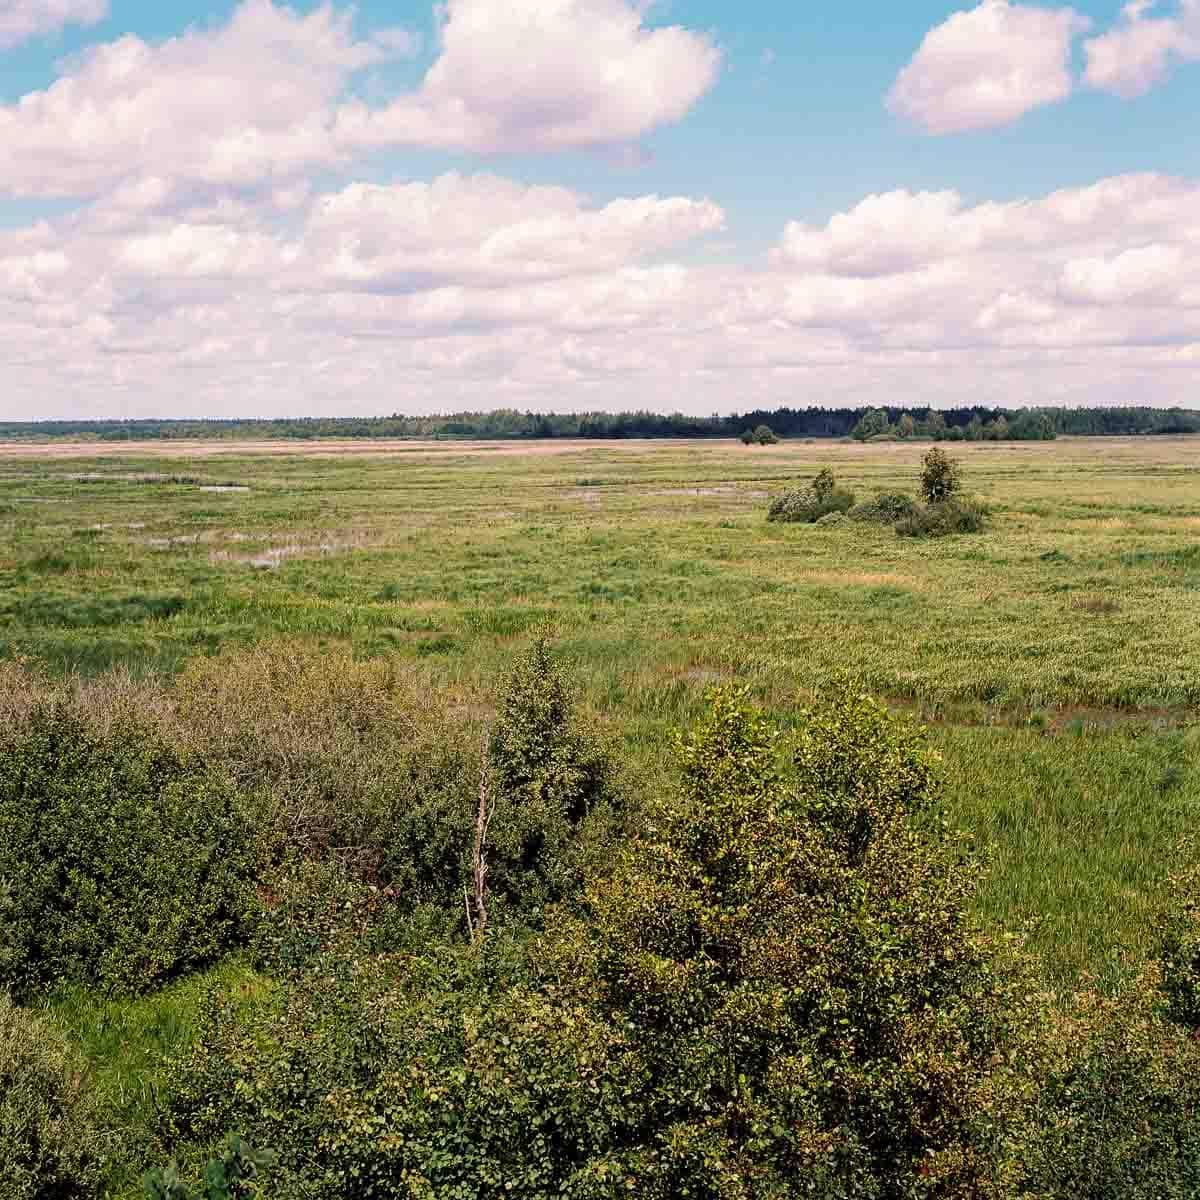 Sumpfgebiet Film: Kodak Portra 160